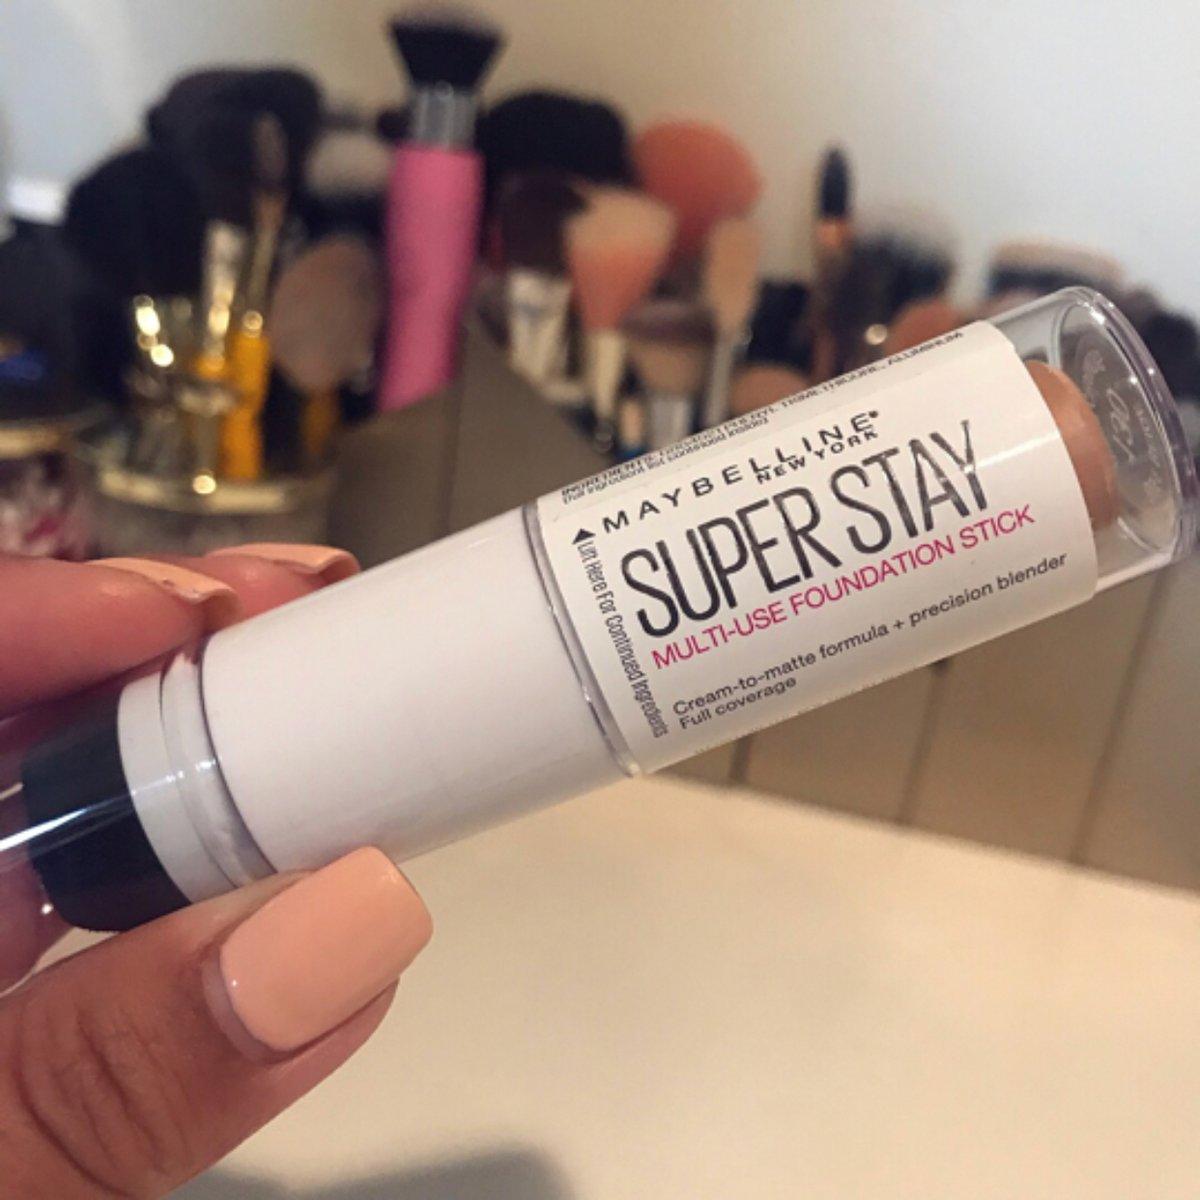 Maybelline Super Stay Multi-Use Foundation Stick